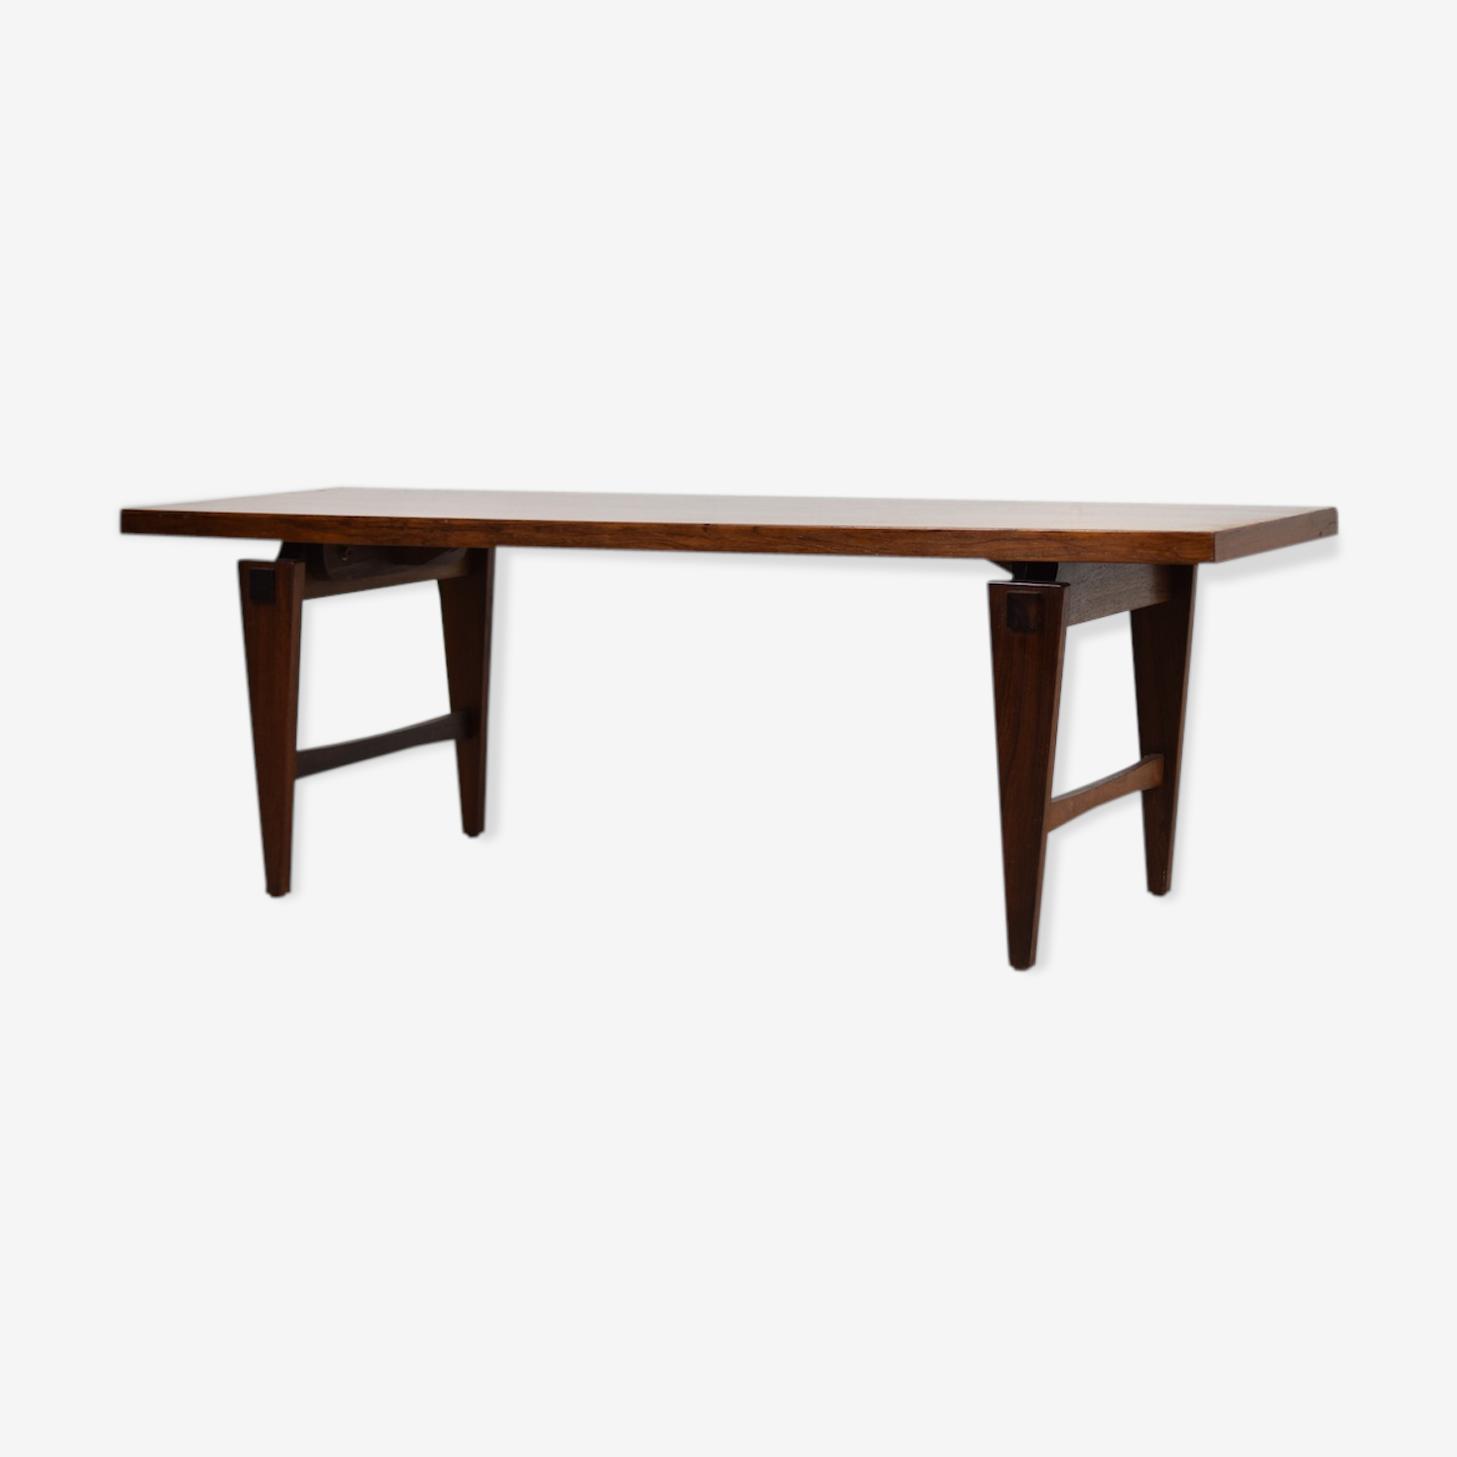 Coffee table by Illum Wikkelsø for Mikael Laursen, Denmark 1960